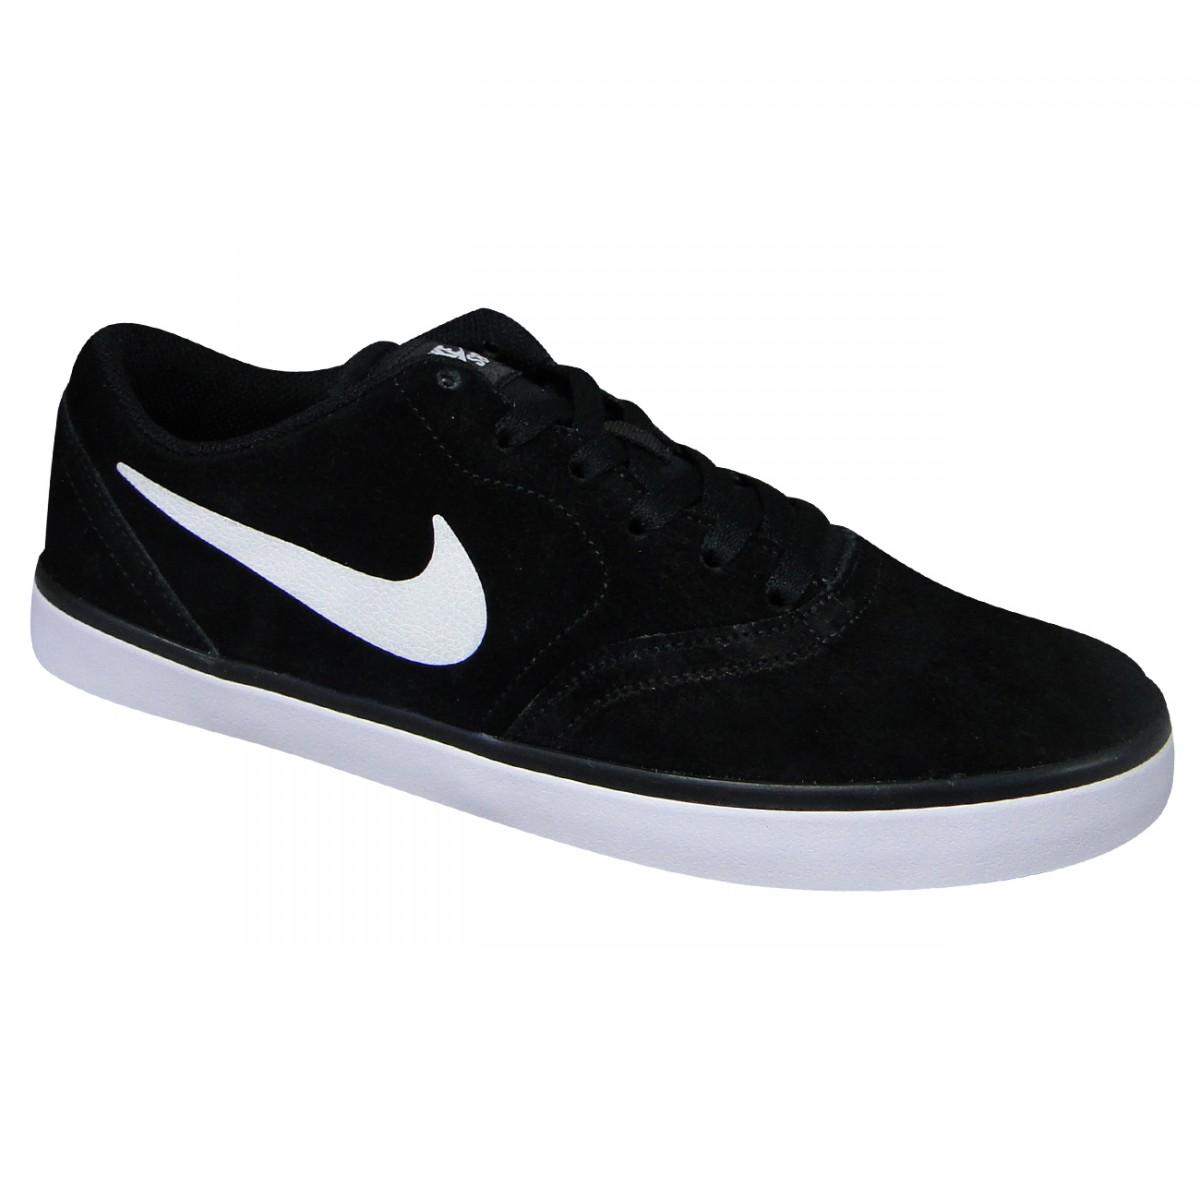 8cdfe03e223 Tenis Nike SB Check 705265 004 - Preto Branco - Chuteira Nike ...